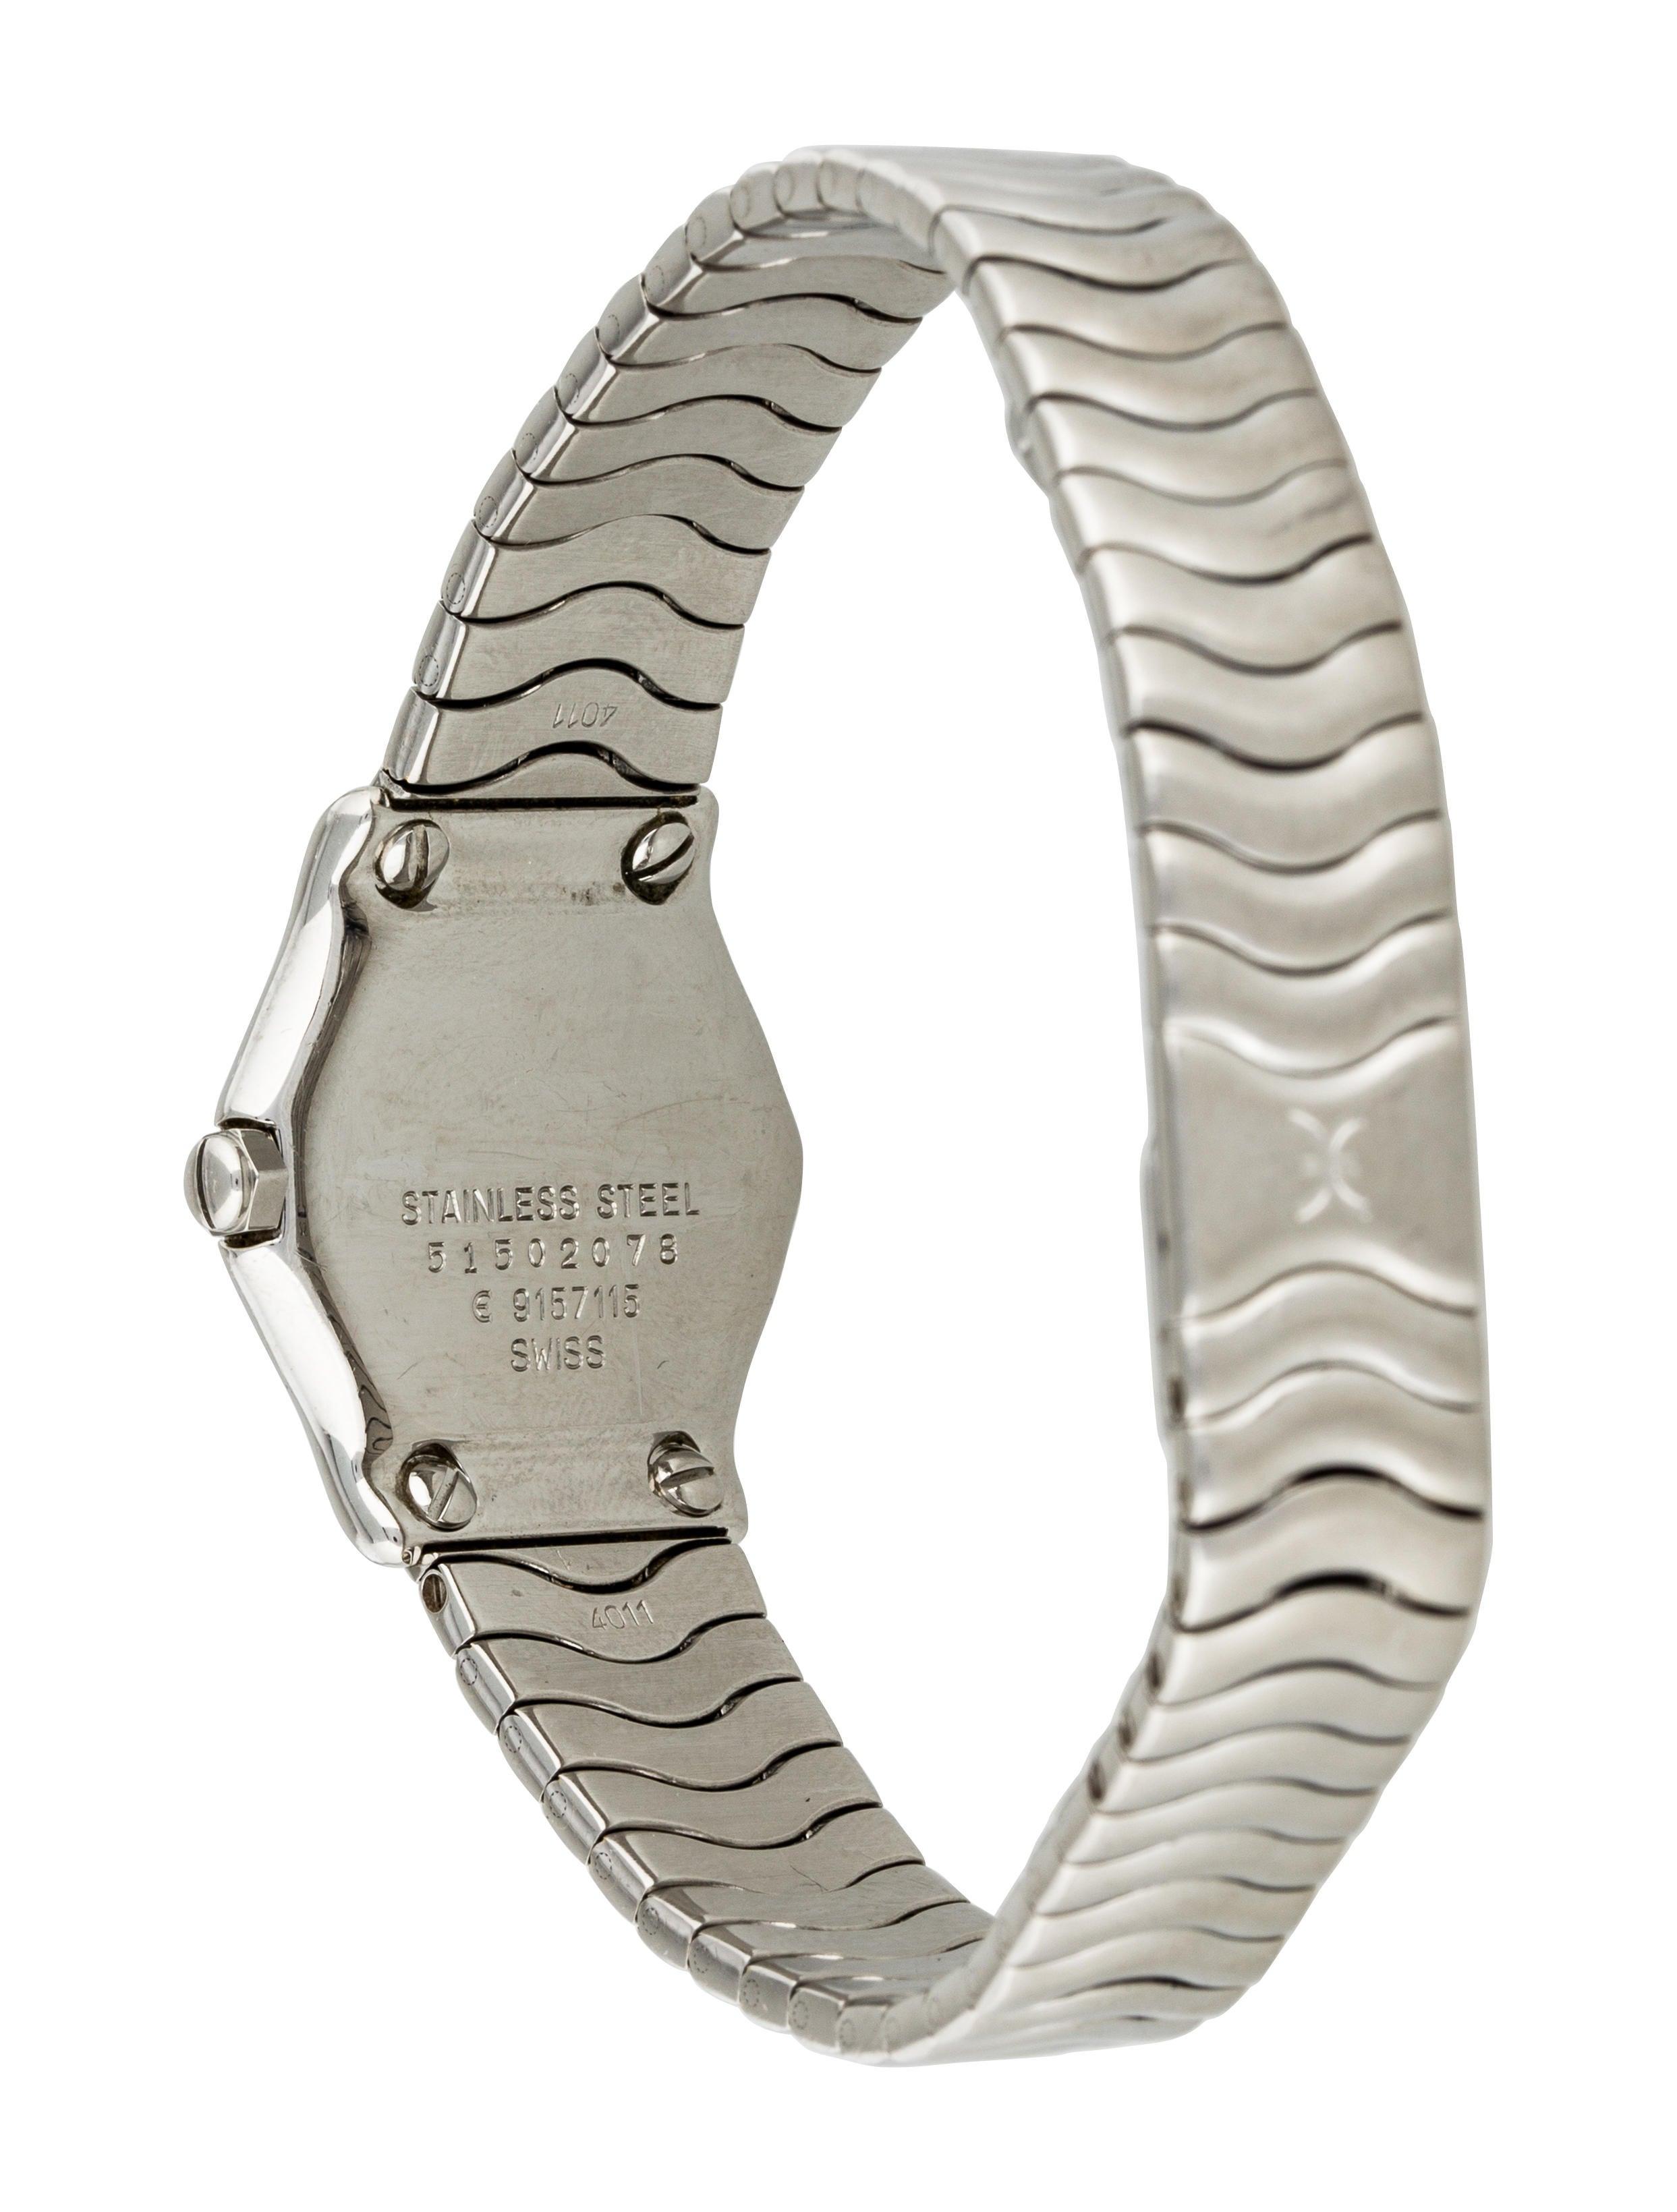 how to spot a ebel replica watch